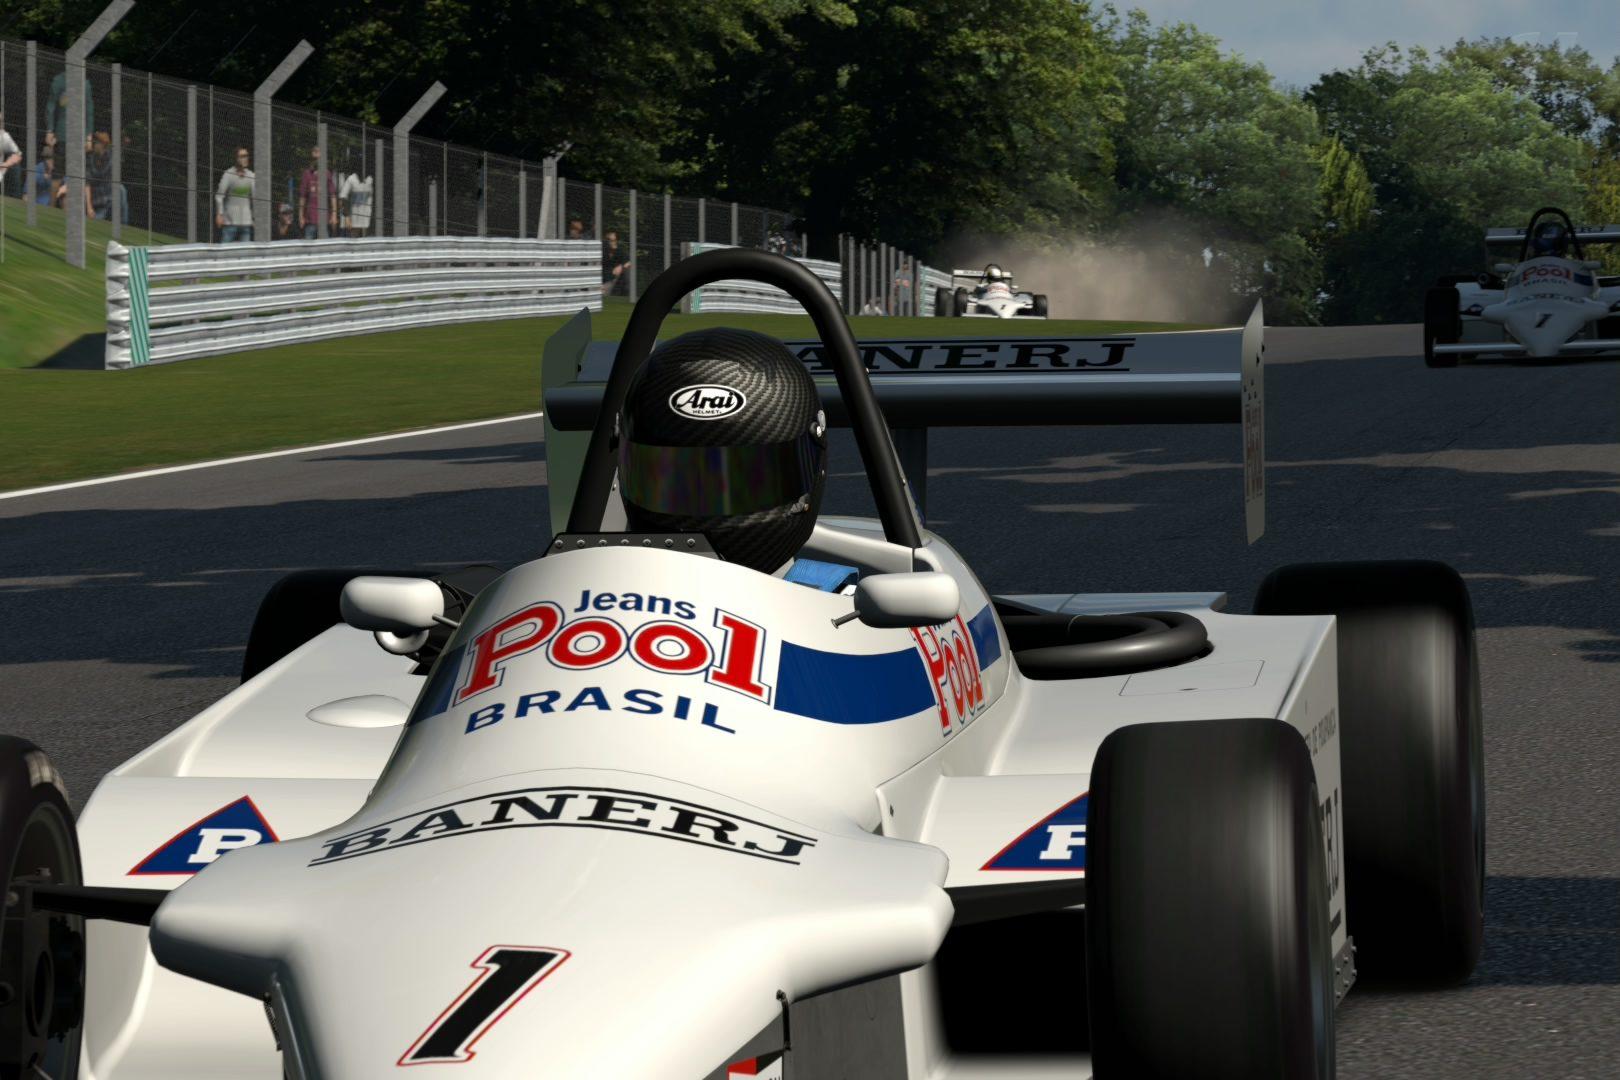 Brands Hatch Grand Prix Circuit '80s_19.jpg